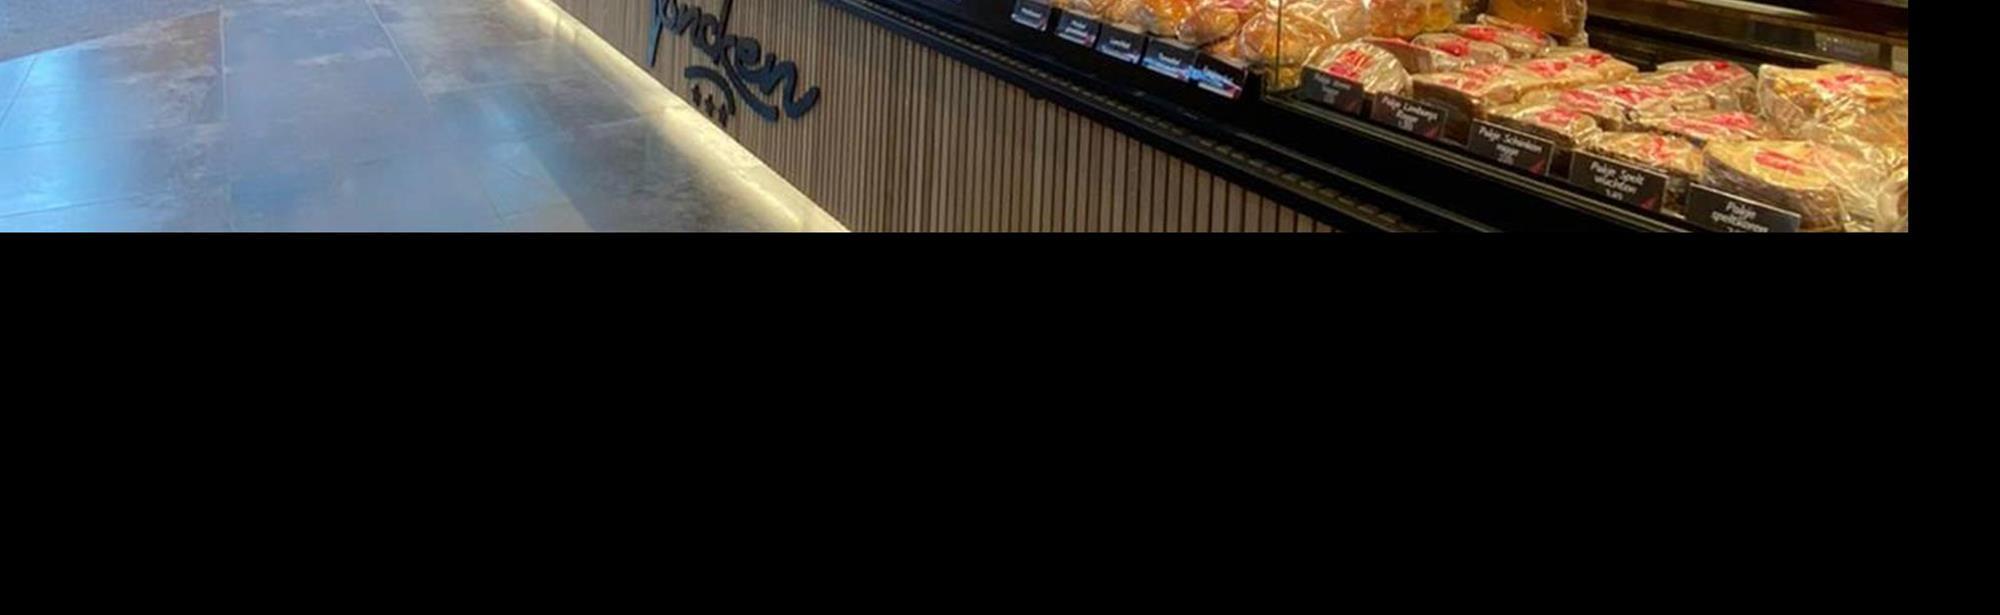 Visit Zuid-Limburg Servicepunt Margraten, Broqua Tweewielers